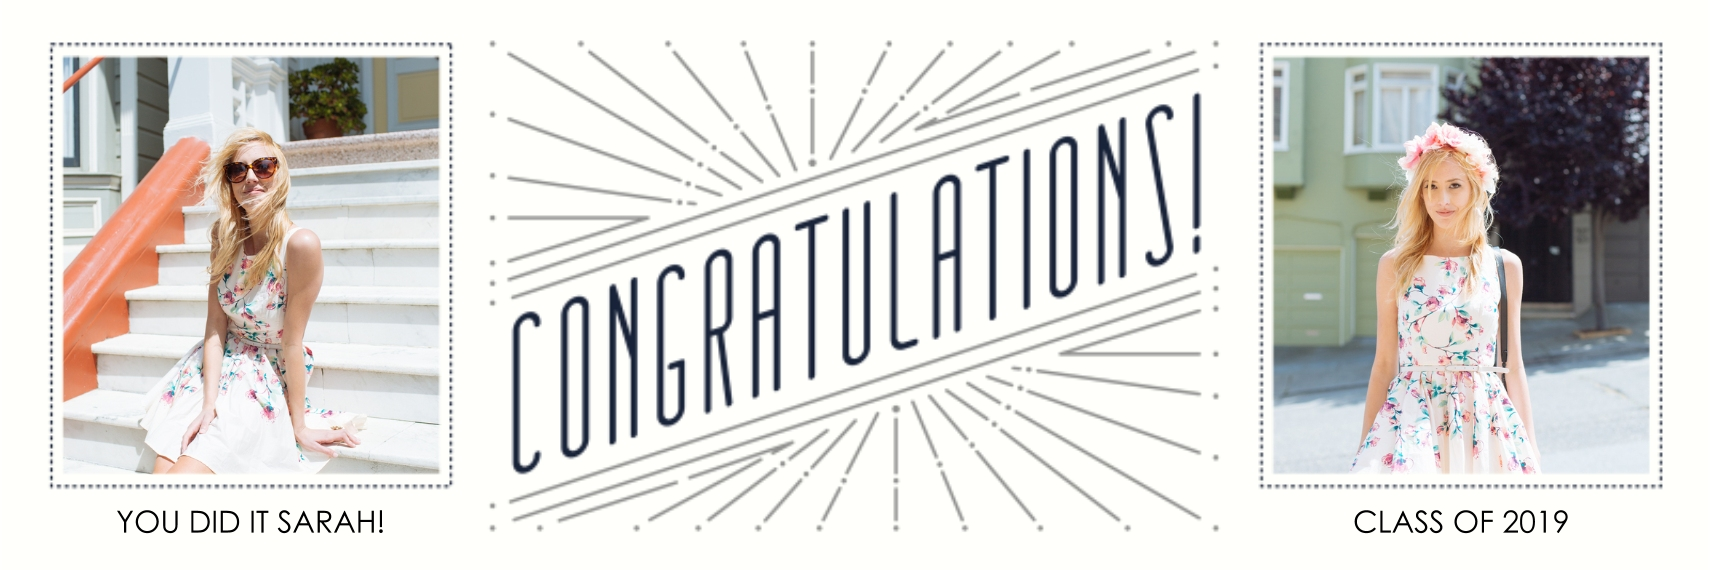 Congratulations 1x3 Adhesive Banner, Home Décor -Art Deco Congratulations